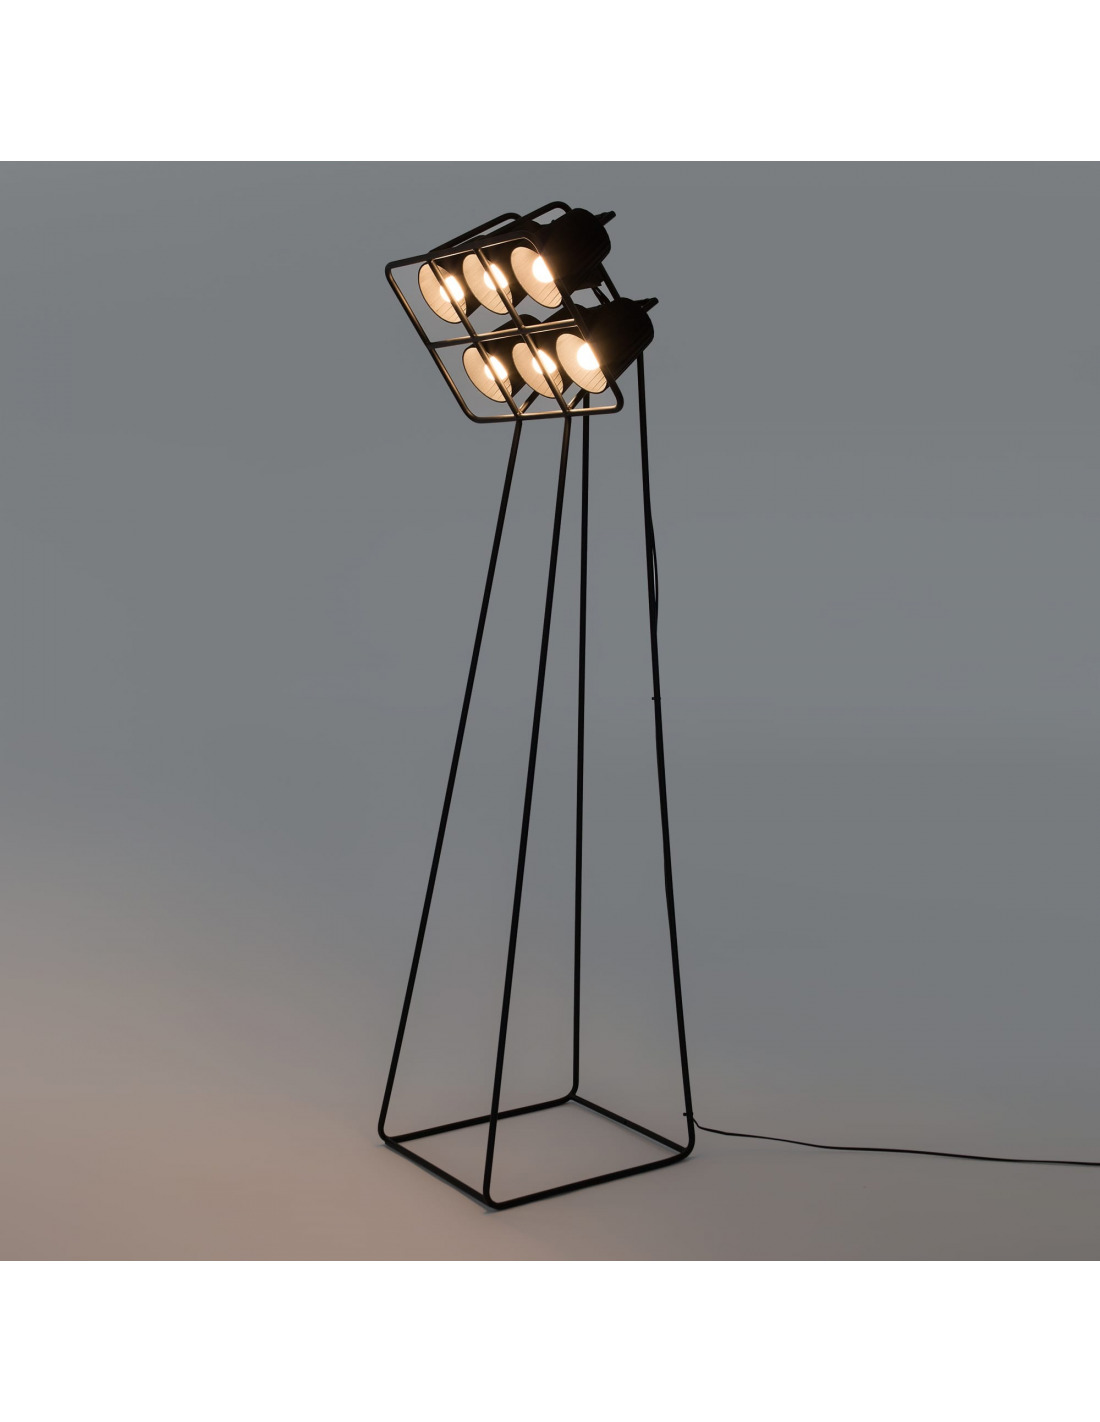 Par Seletti Lampadaire Multilamp Au Industriel Style ARc35jqL4